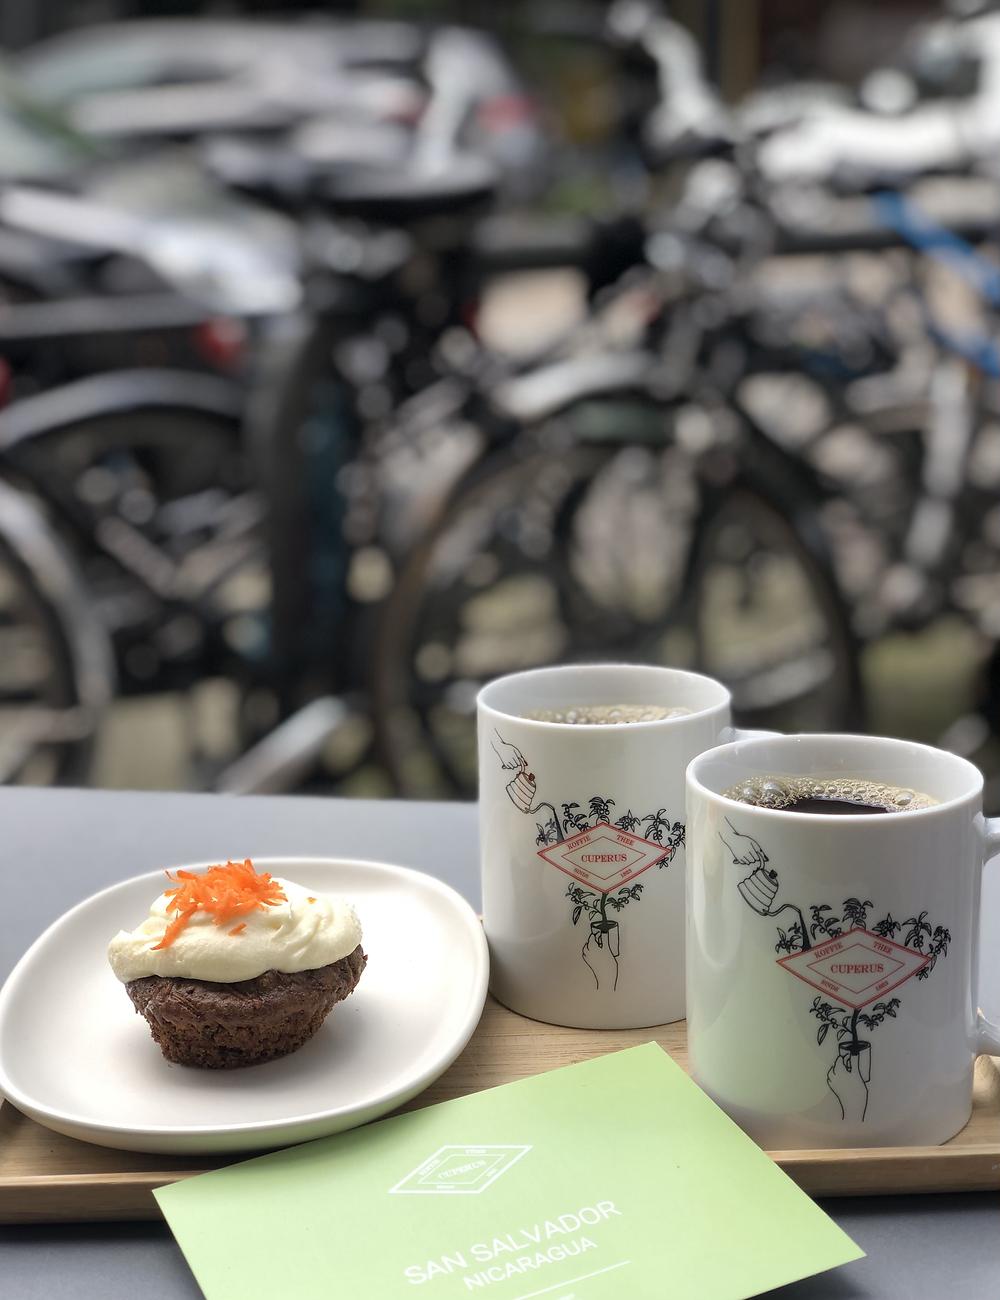 Cuperus Coffee Horsey Antwerp